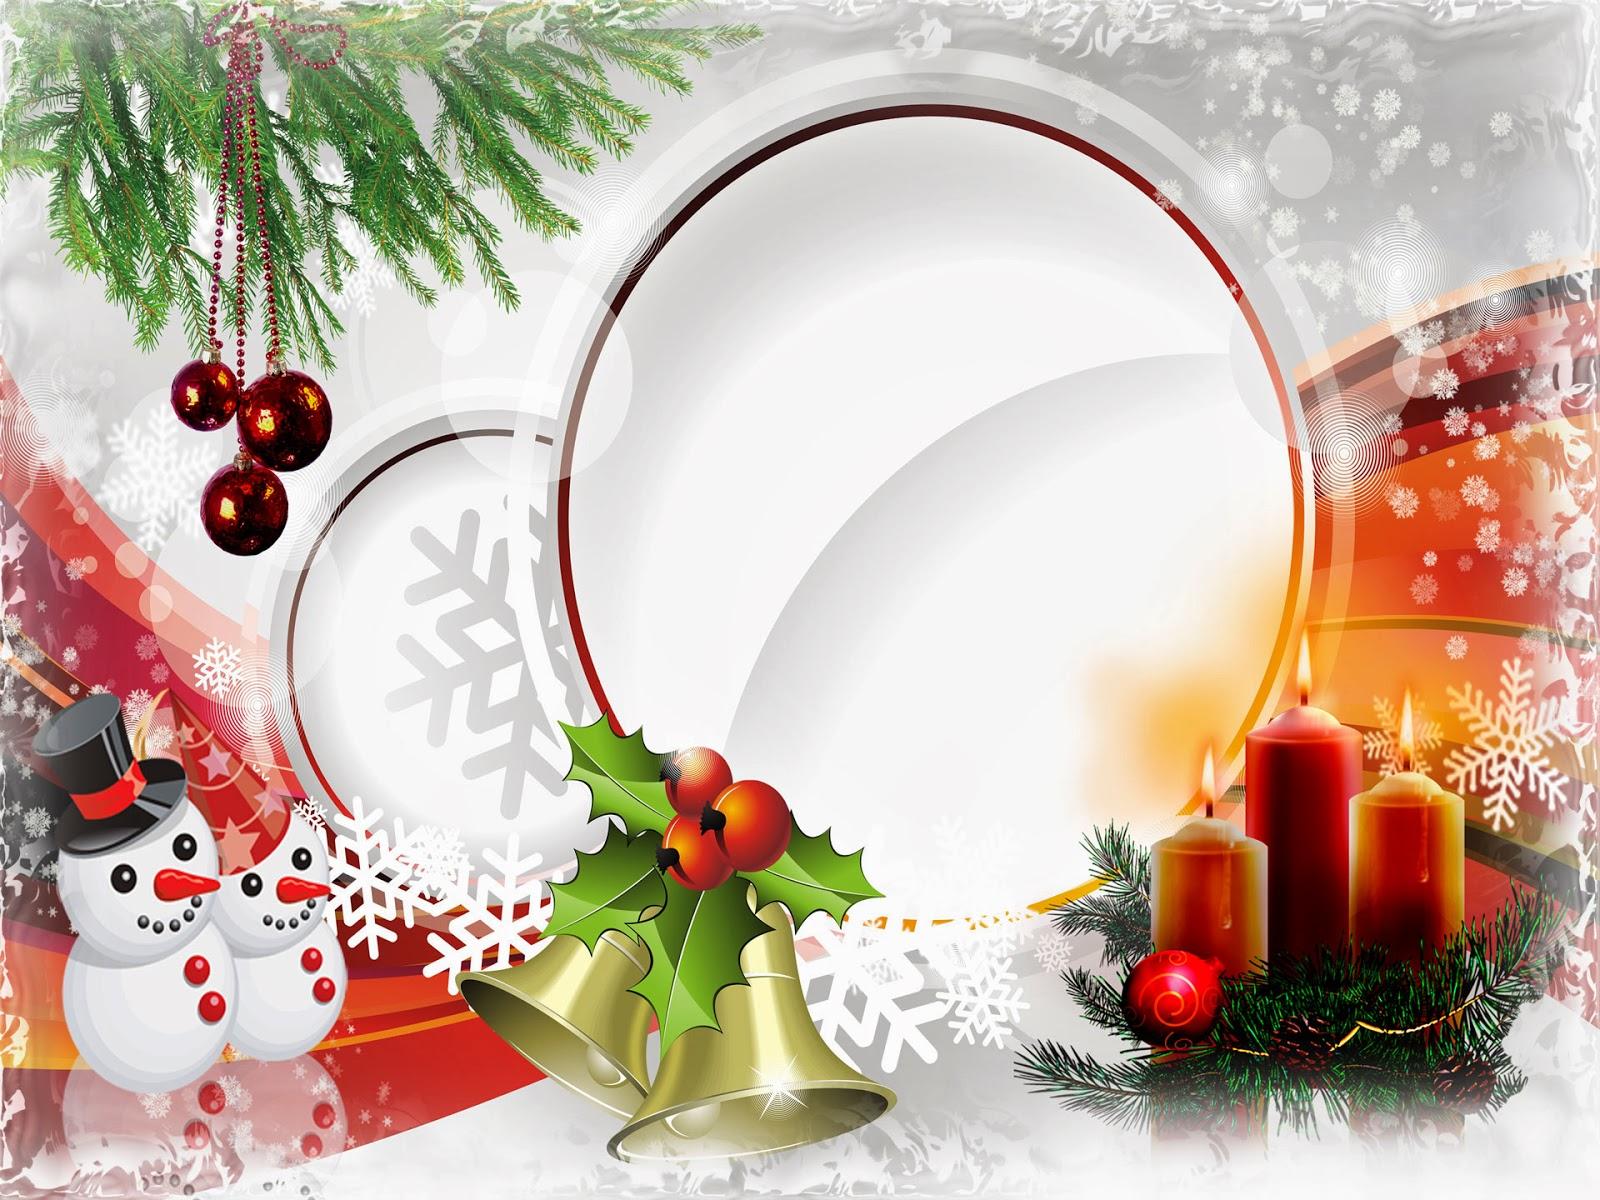 christmas photo frame cards - Kubre.euforic.co